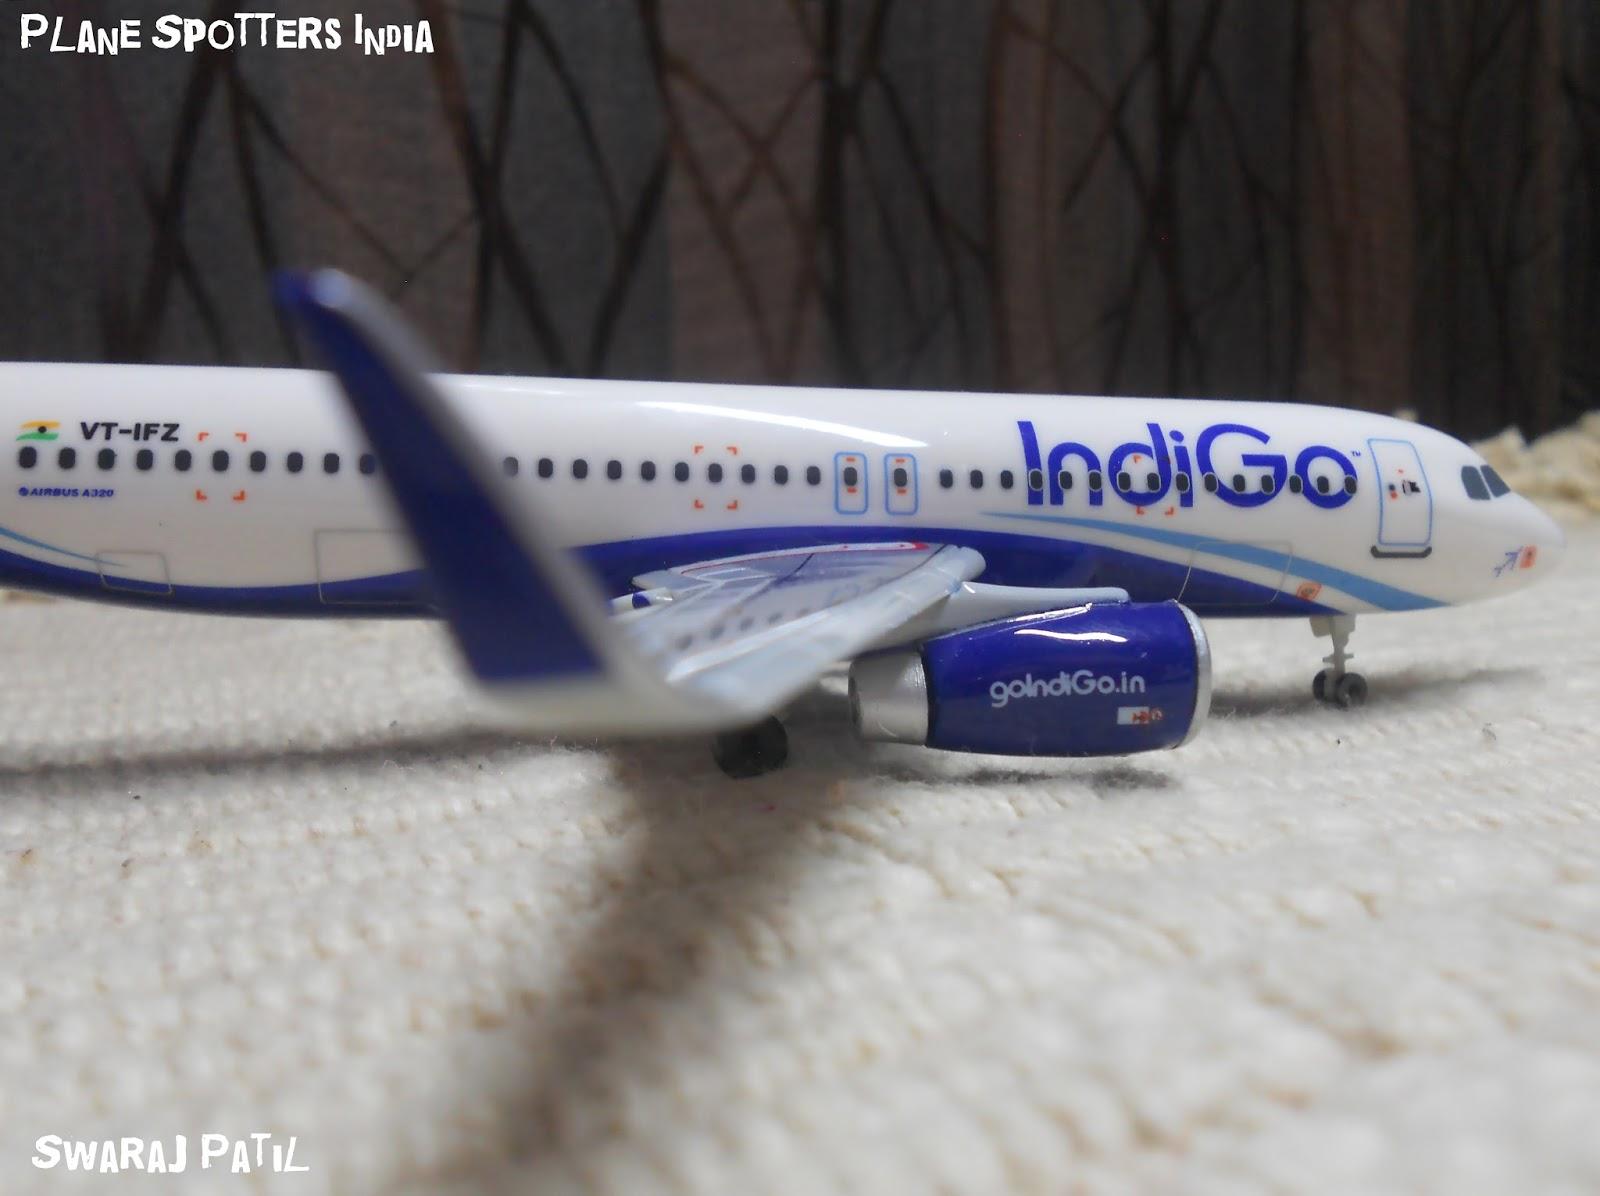 Indigo's Airbus A320   1:200 Scale Model   - Plane Spotters India